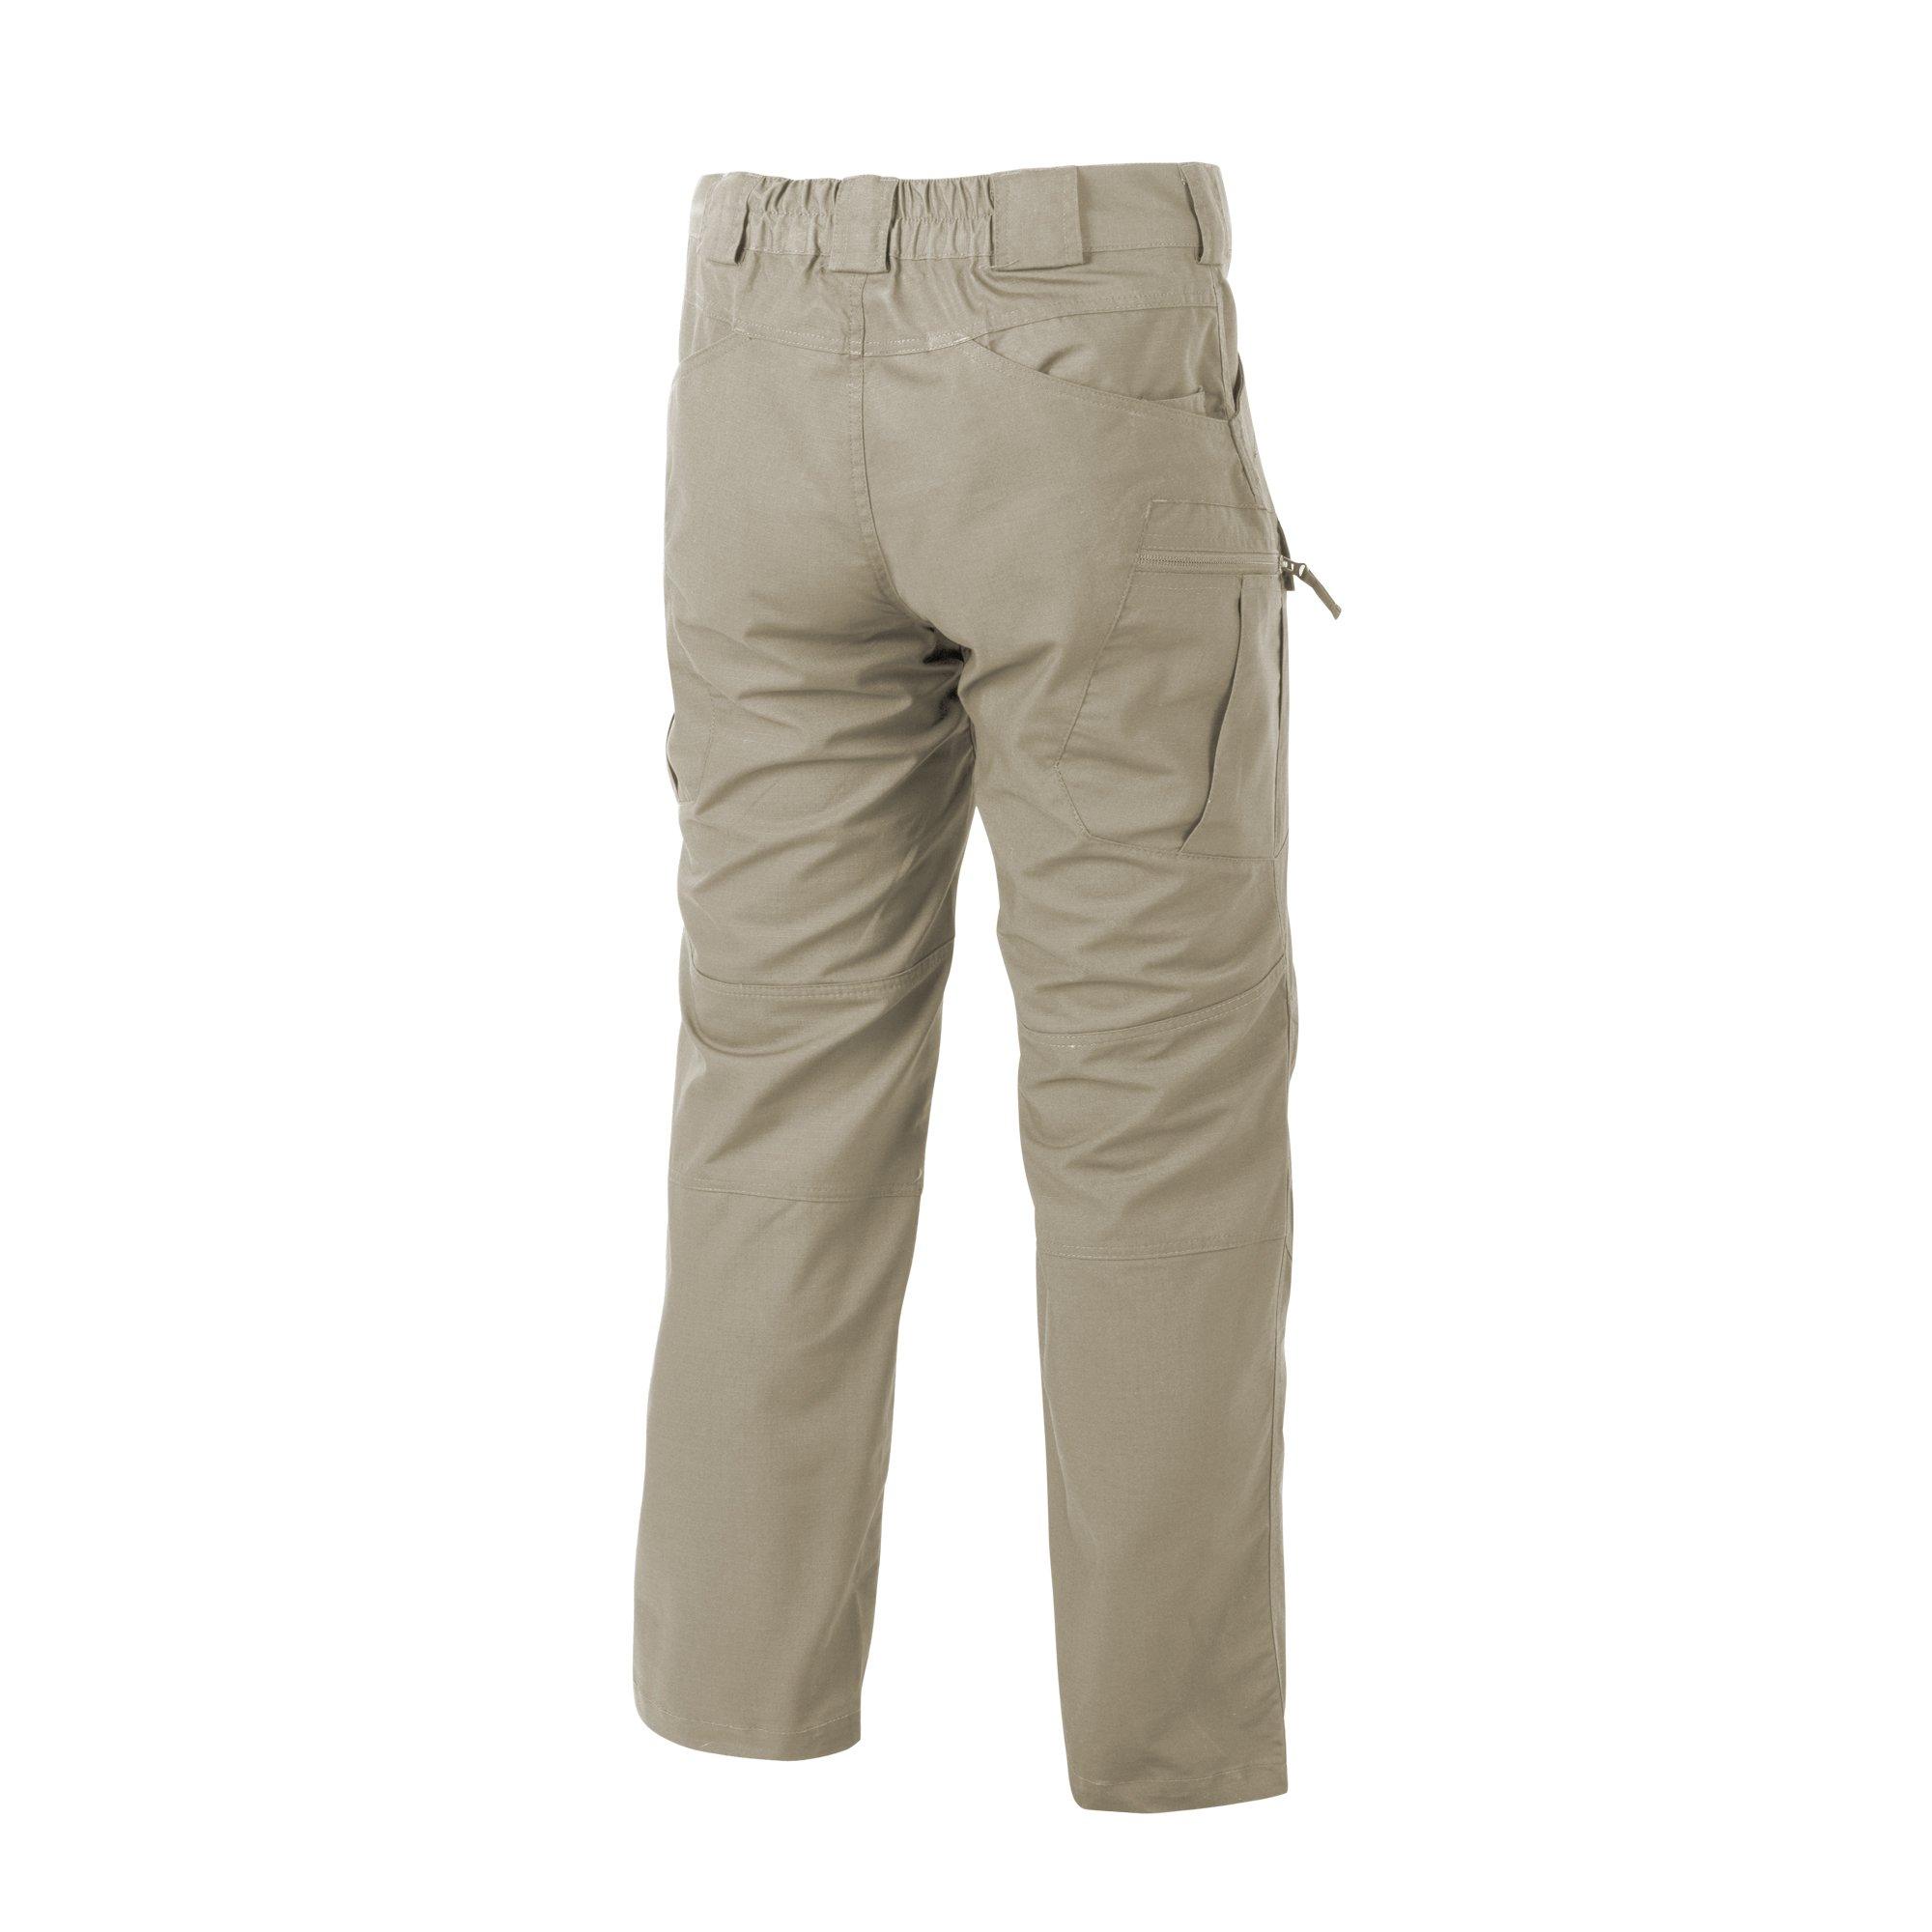 HELIKON-TEX Urban Line, UTP Urban Tactical Pants Ripstop Khaki, Military Ripstop Cargo Style, Men's Waist 38 Length 32 by HELIKON-TEX (Image #2)